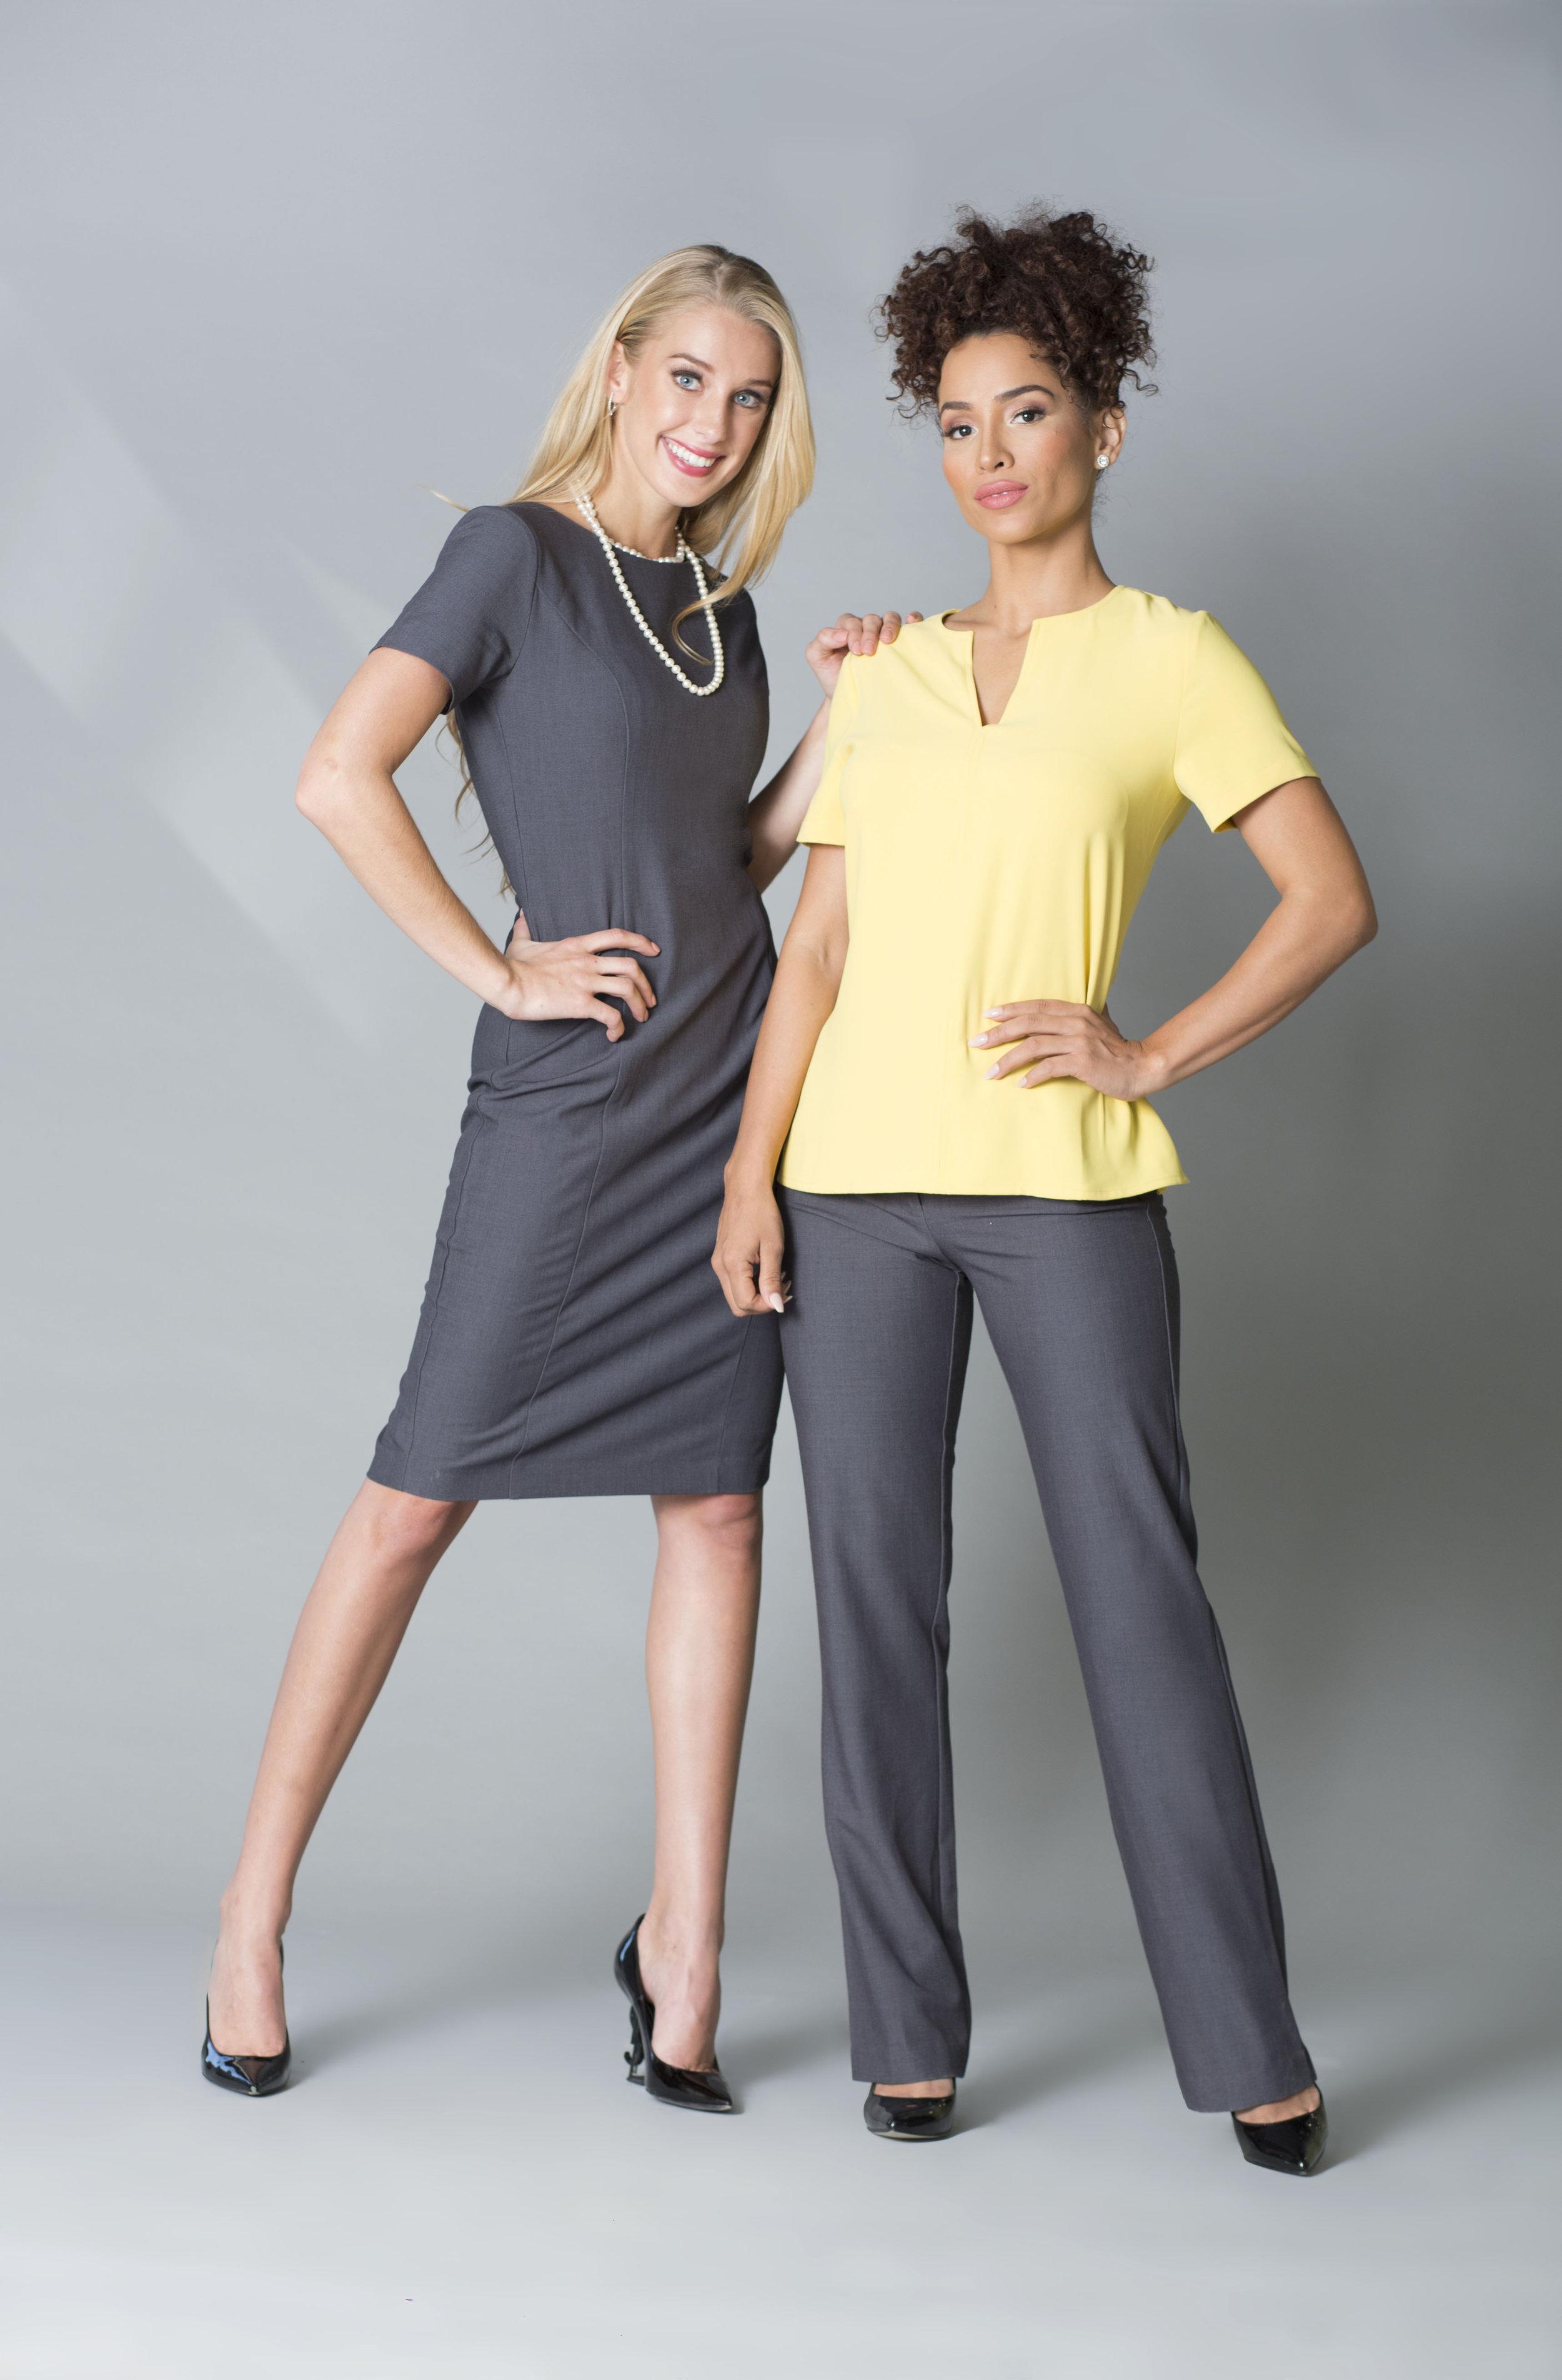 MDSN y MRC Vestido gris - mili yellow pant gris copy.jpg